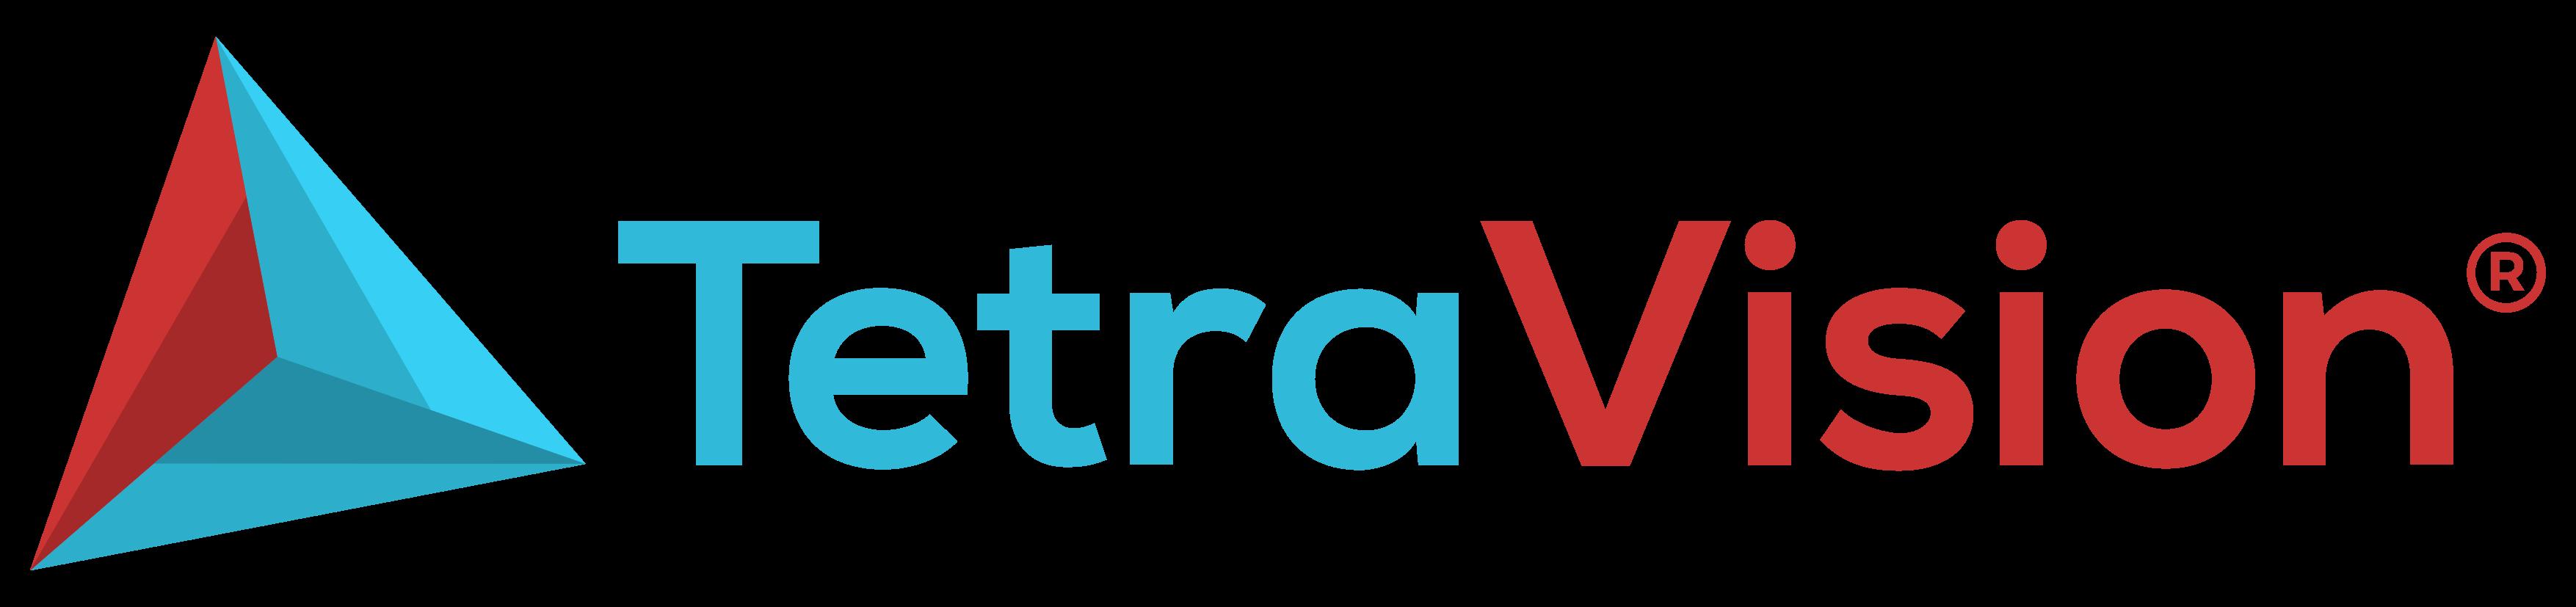 Tetravision-logo-01-1-2-1-1-1-1-1-1-1-1-1-1-1-1-1-1-1-1-1-1-1-1-1-1-1-1-1-1-1-1-1-1-1-1-1-1-1-1-1-1.png